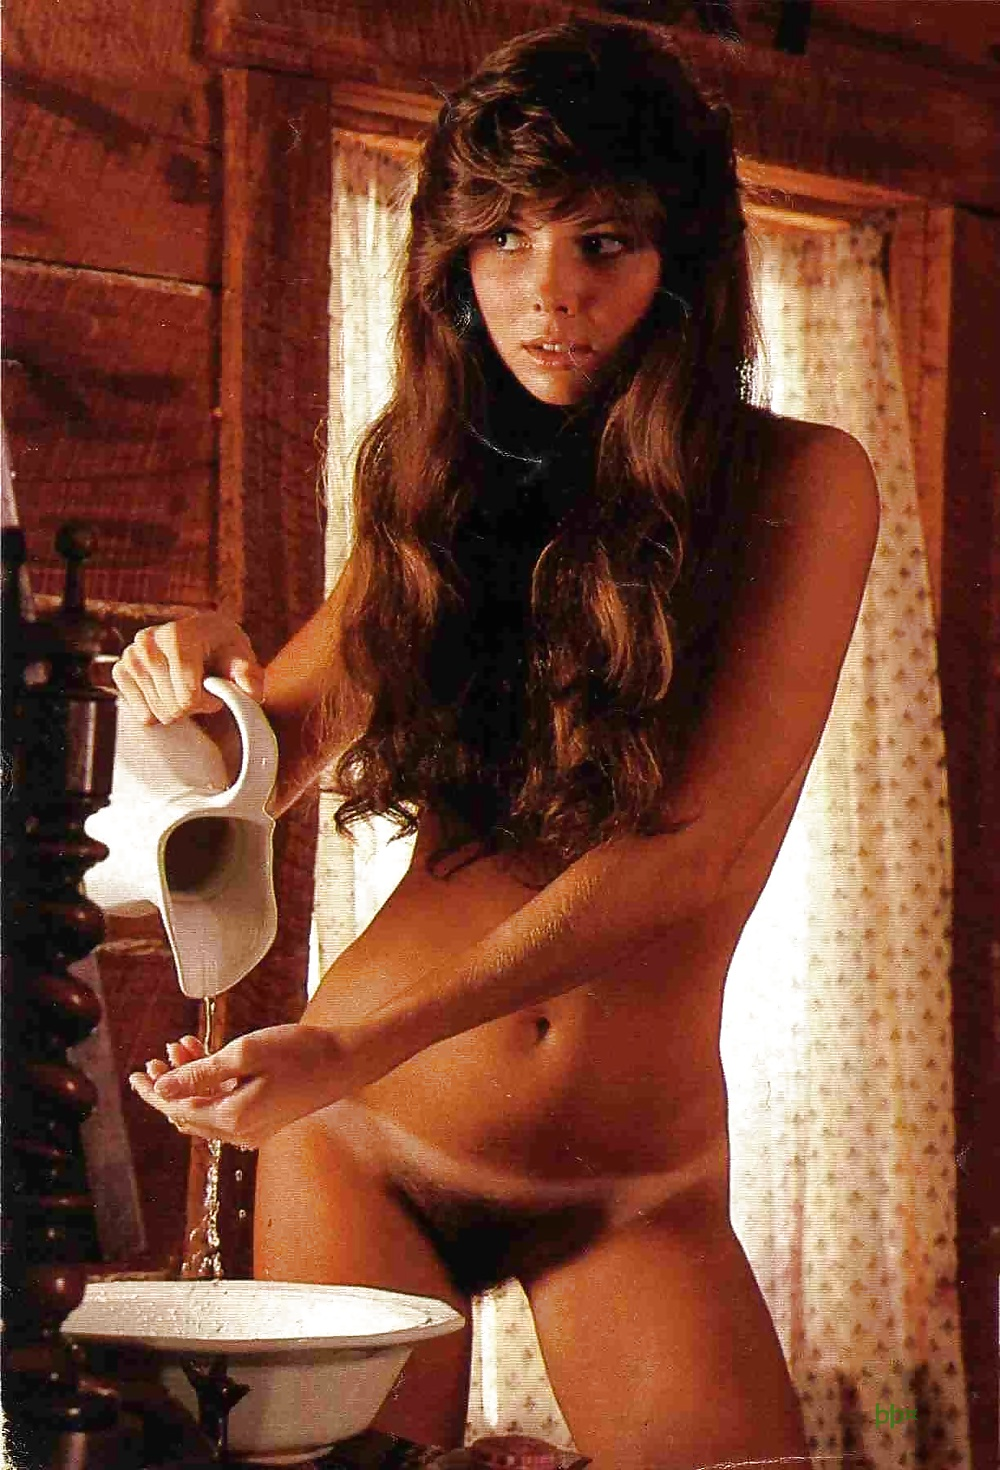 Fake nude images of laura san giacomo — photo 4